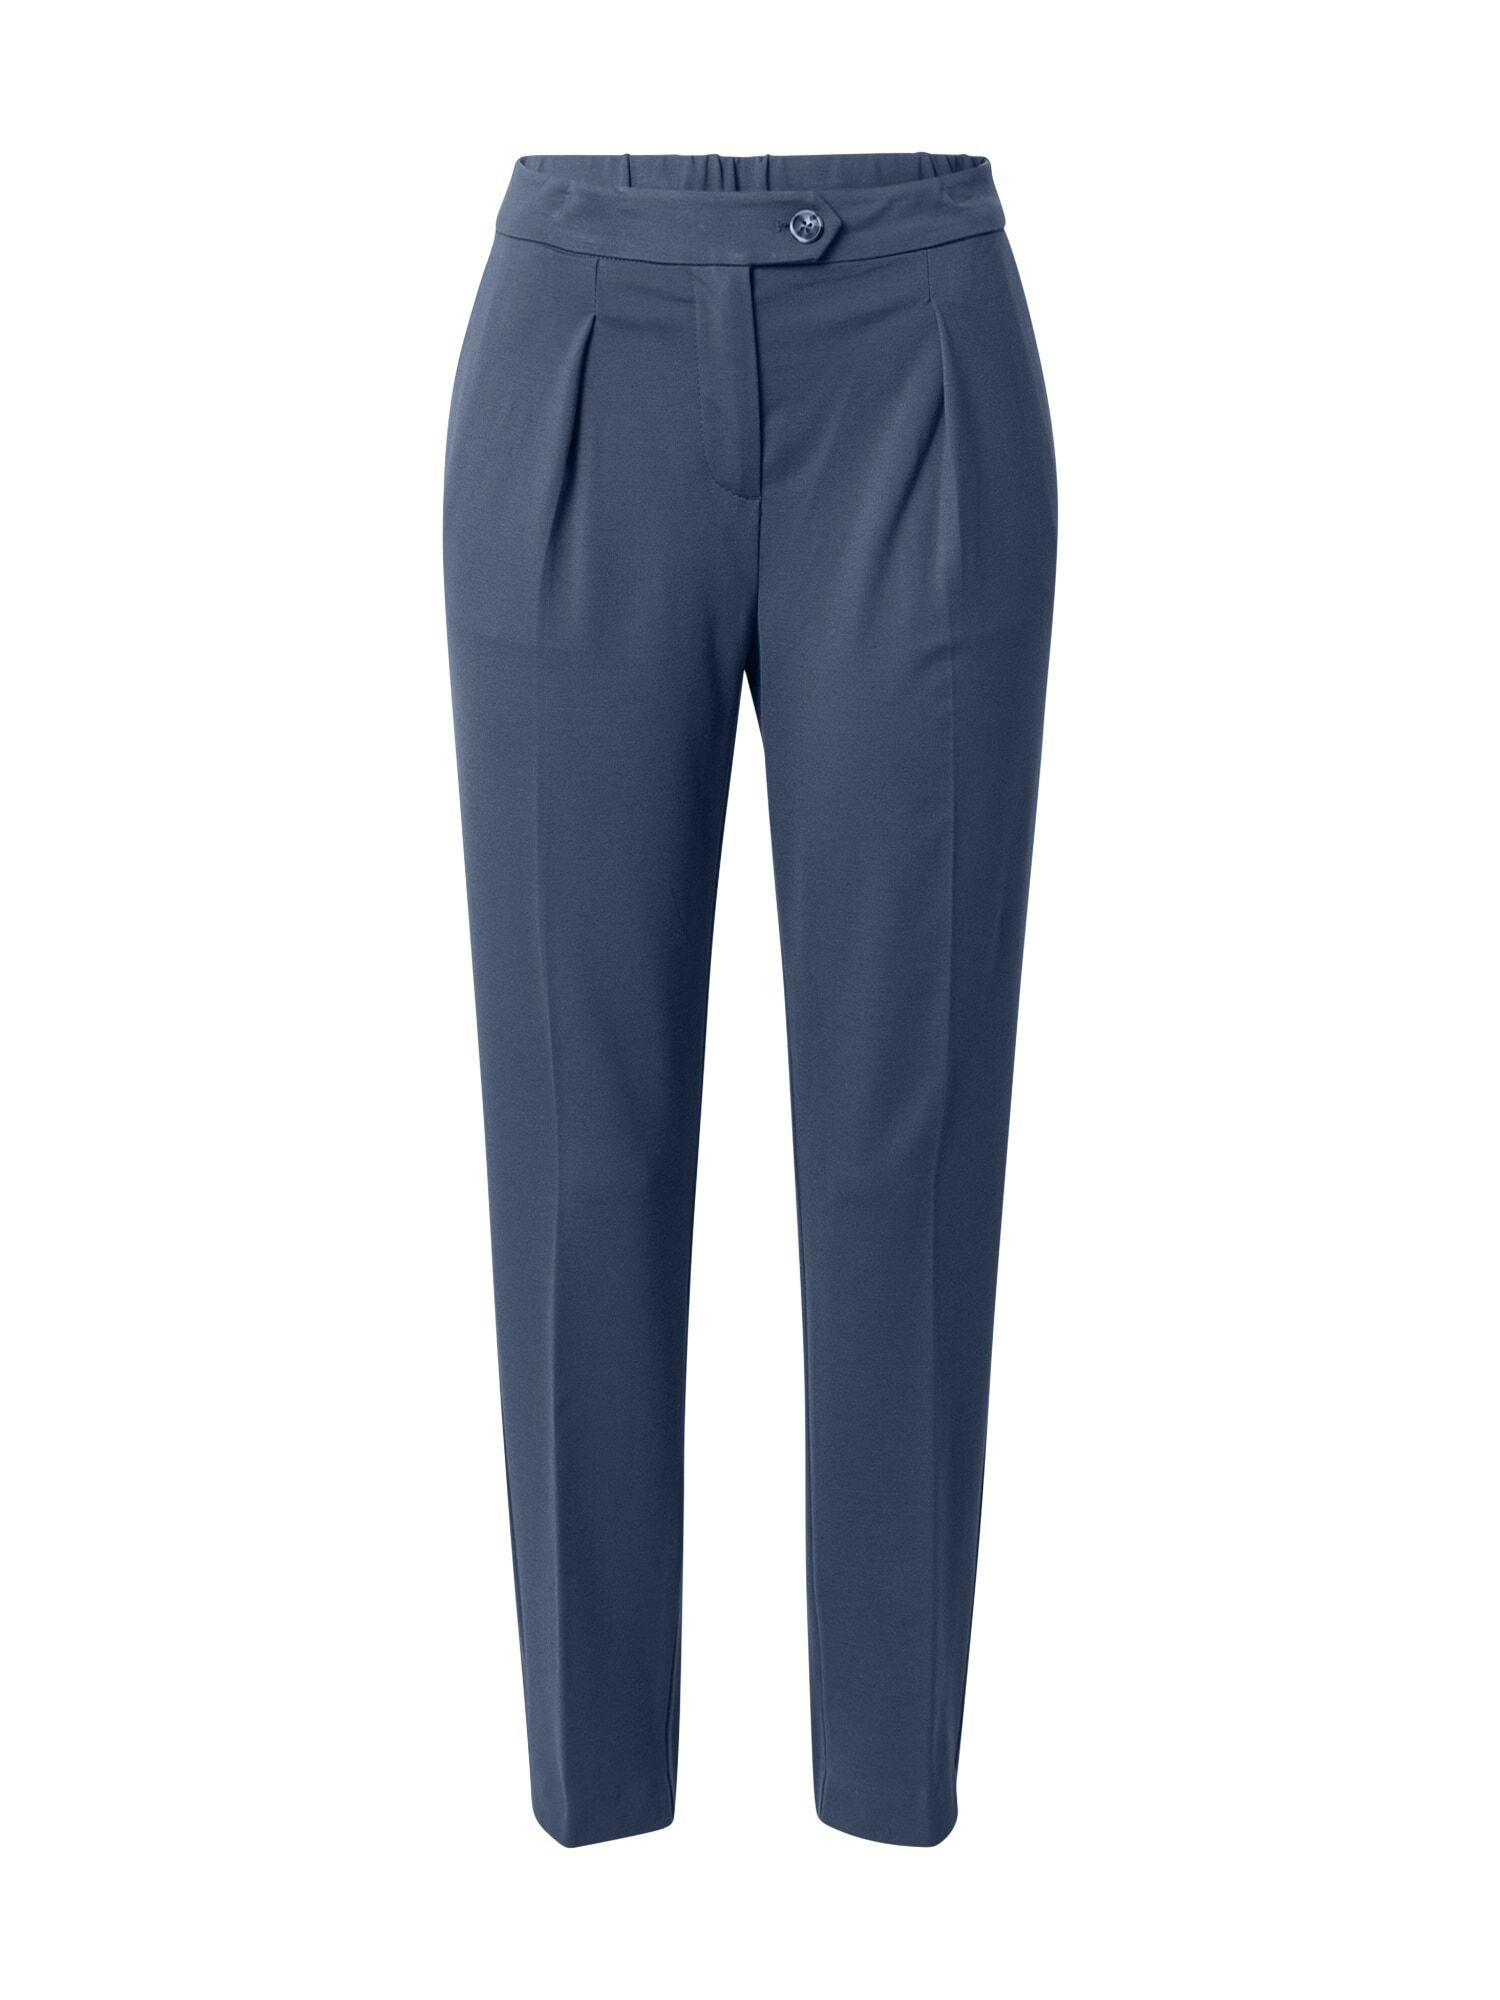 MINE TO FIVE Pantalon à pince  - Bleu - Taille: 40 - female